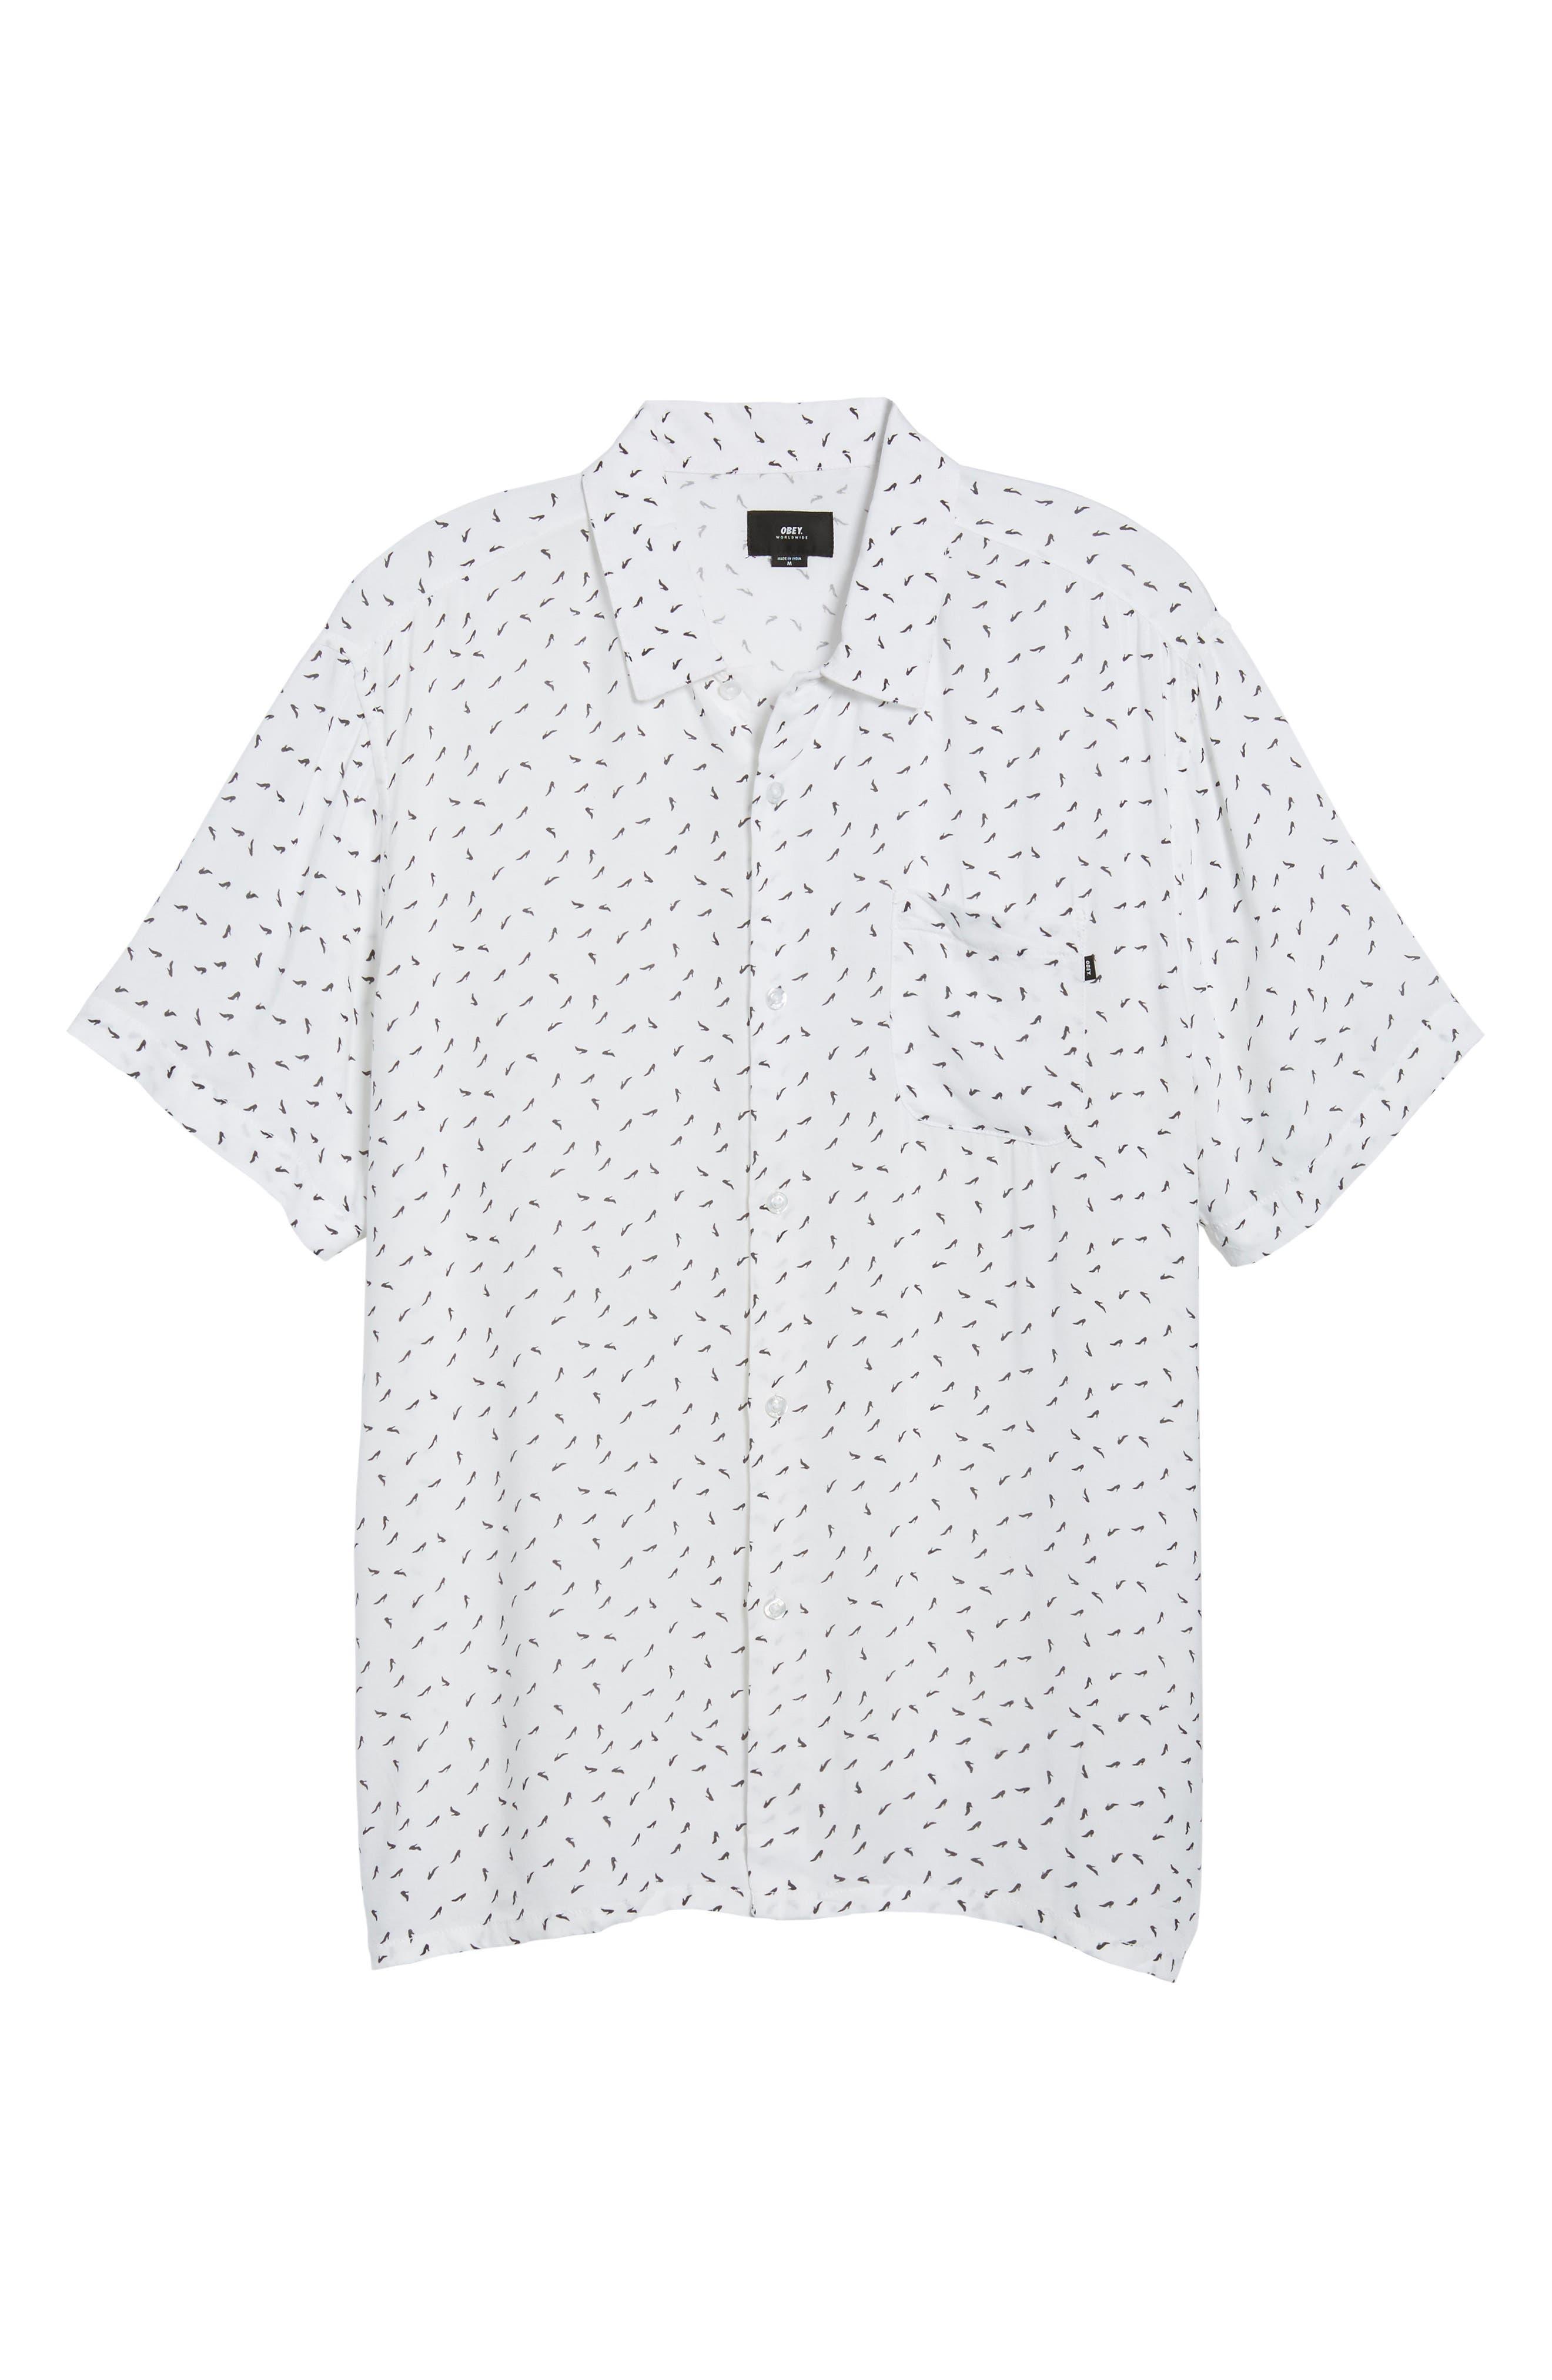 Pumps Short Sleeve Shirt,                             Alternate thumbnail 6, color,                             102